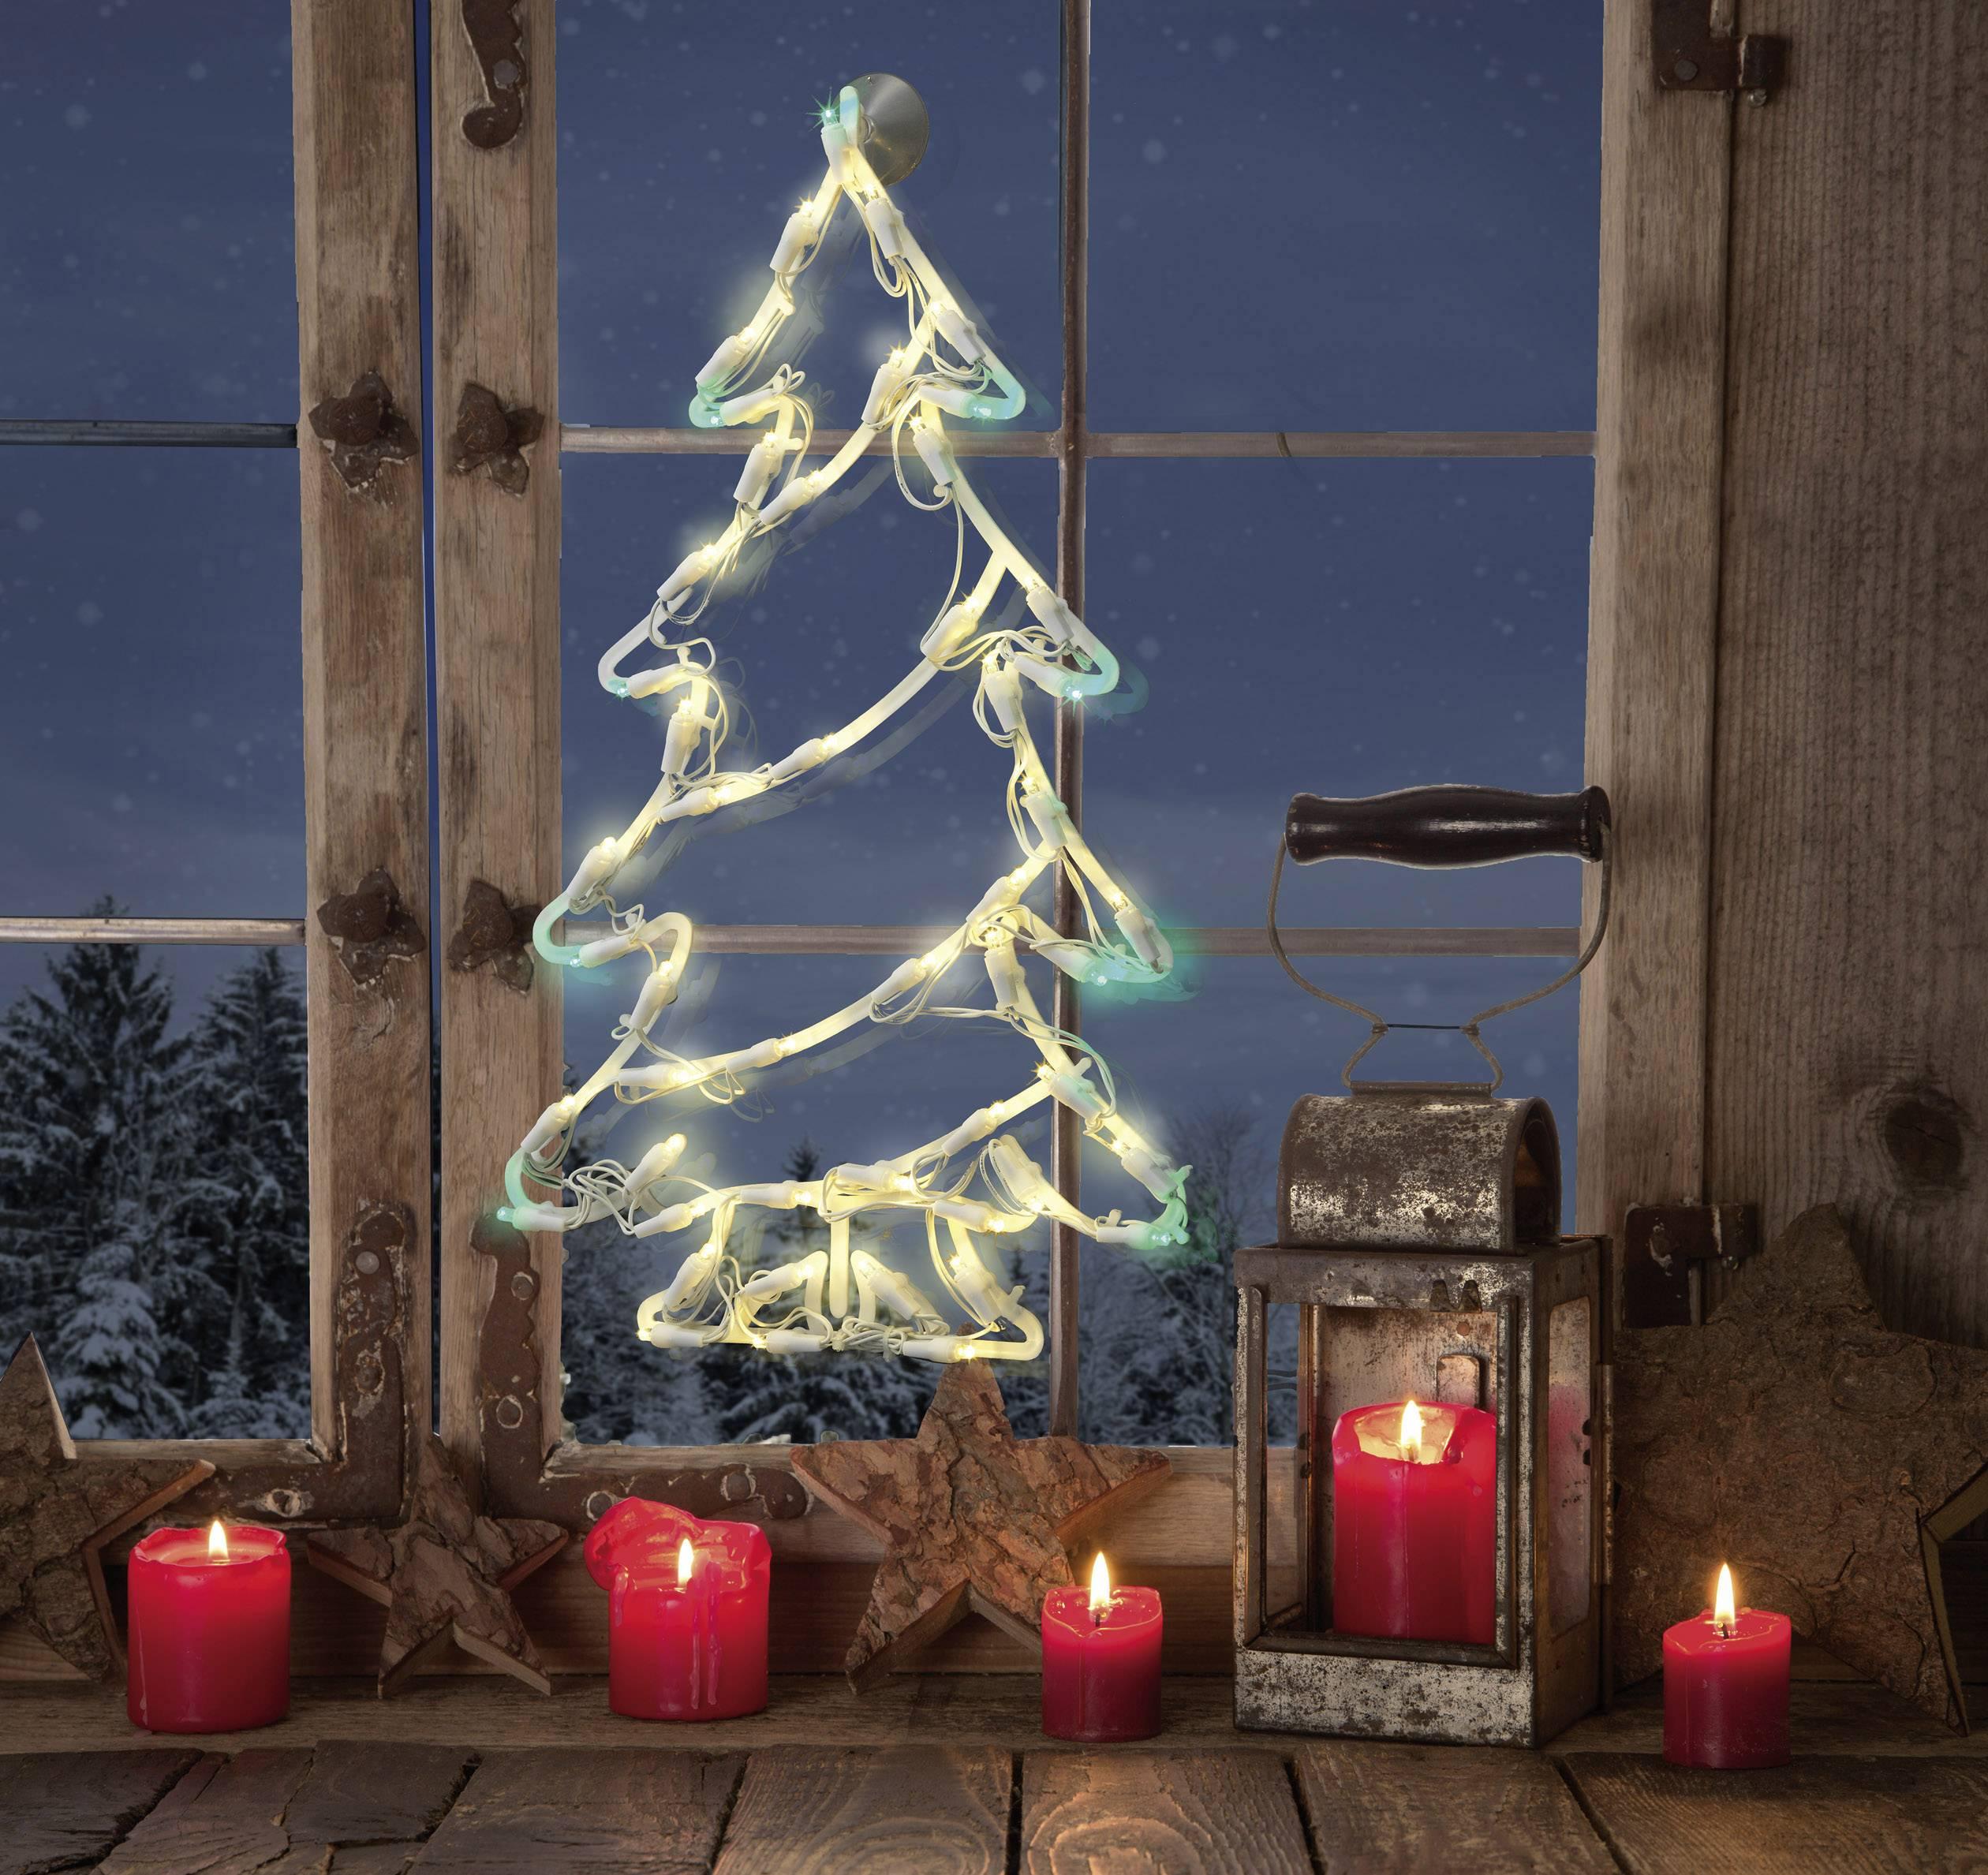 Albero Di Natale Java.Albero Di Natale Java Disegni Di Natale 2019